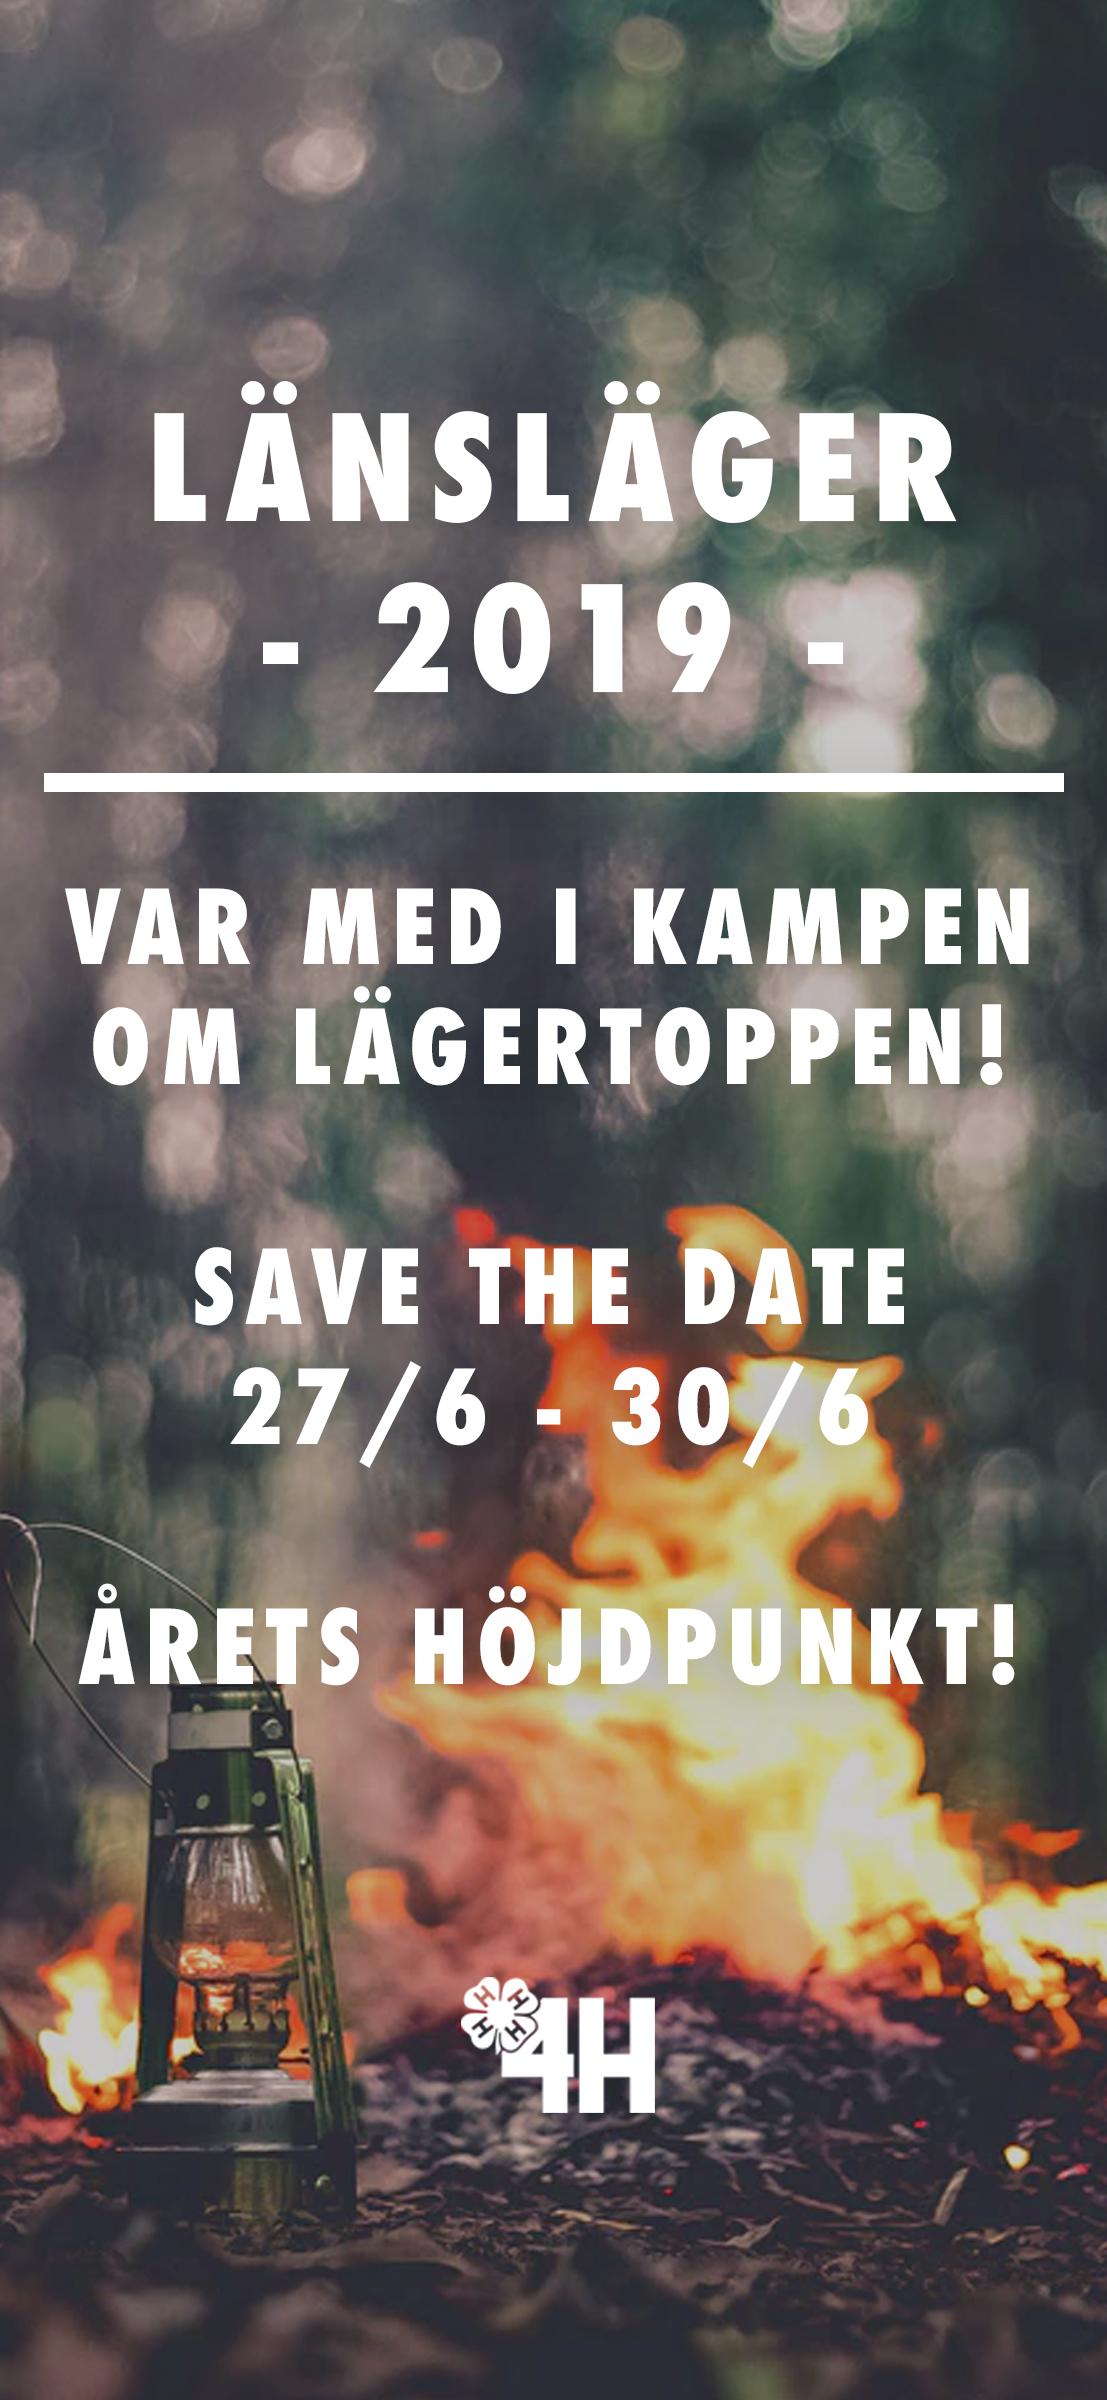 Länsläger_2019_Save_The_Date